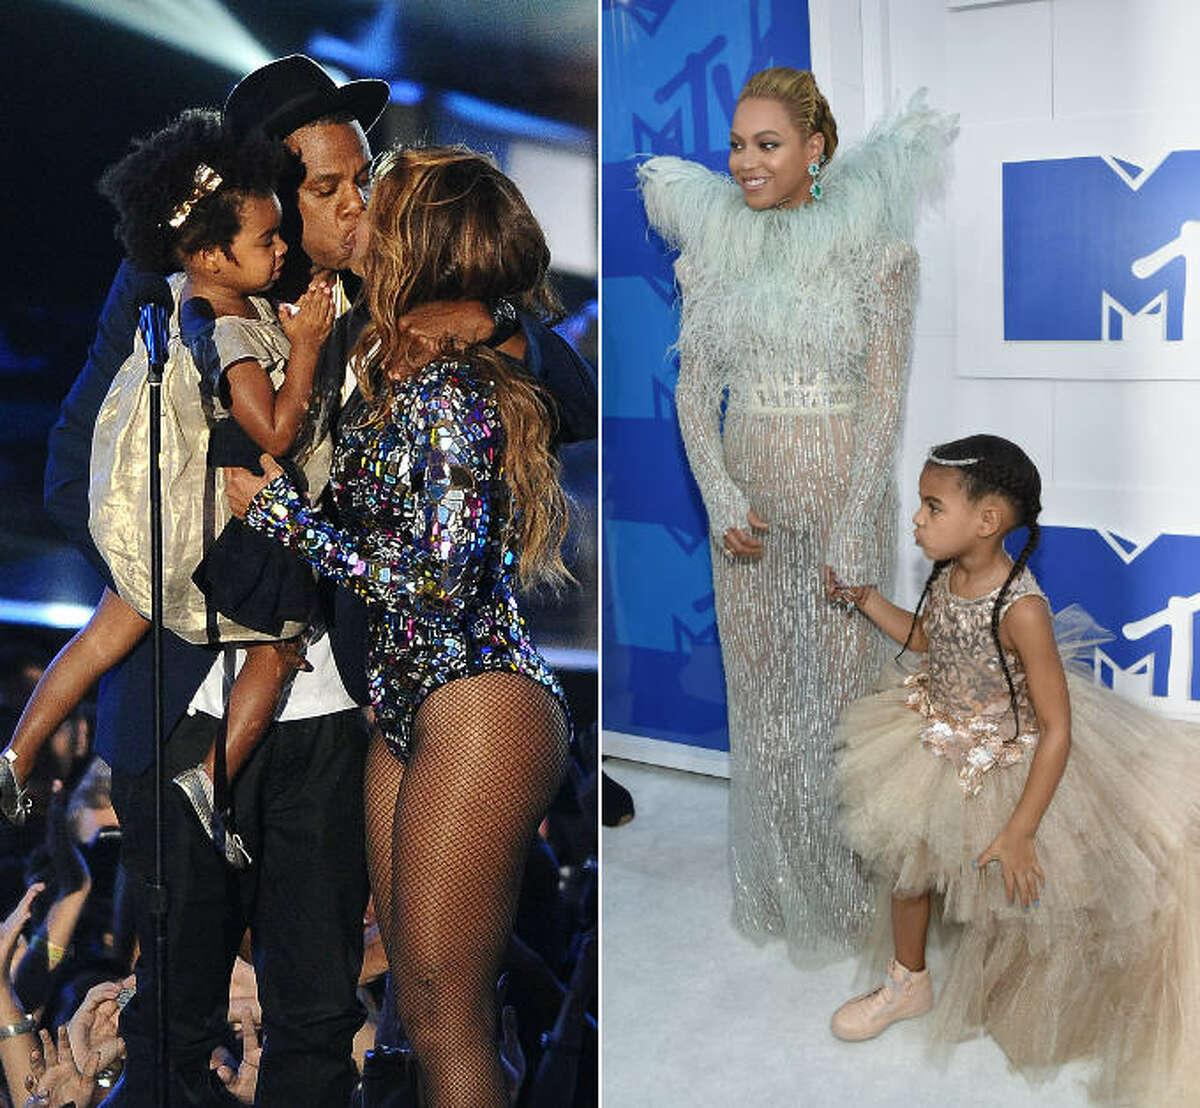 Beyonce, Jay Z and Blue Ivy at the 2014 VMAs, and a Jay Z-less bunch at the 2016 VMAs.